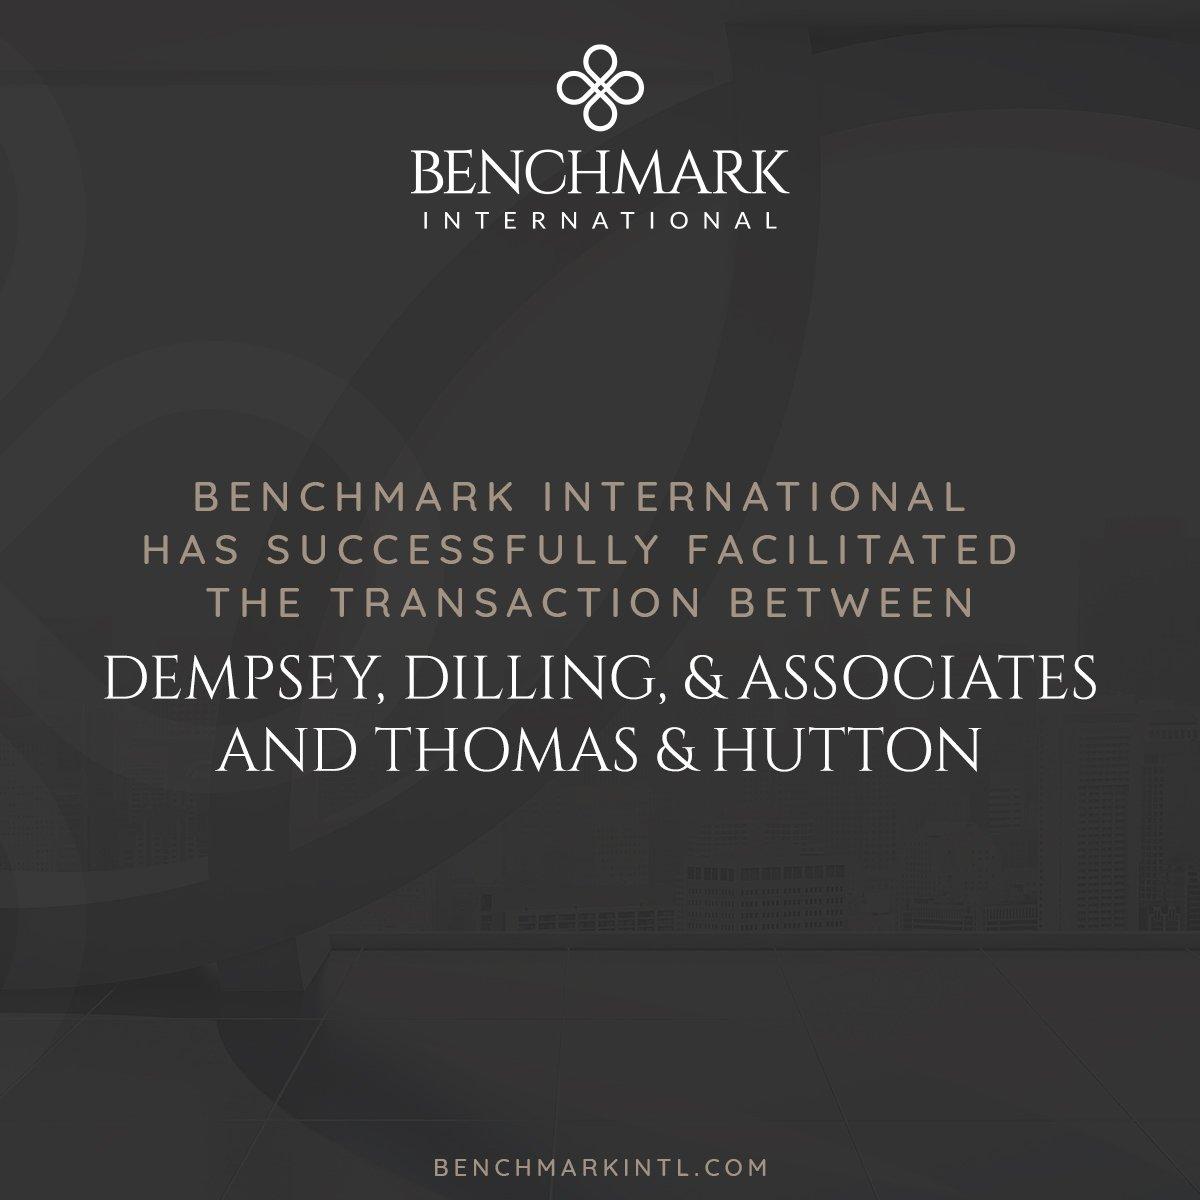 Dempsey&Dilling_to_Thomas&Hutton_Social-1